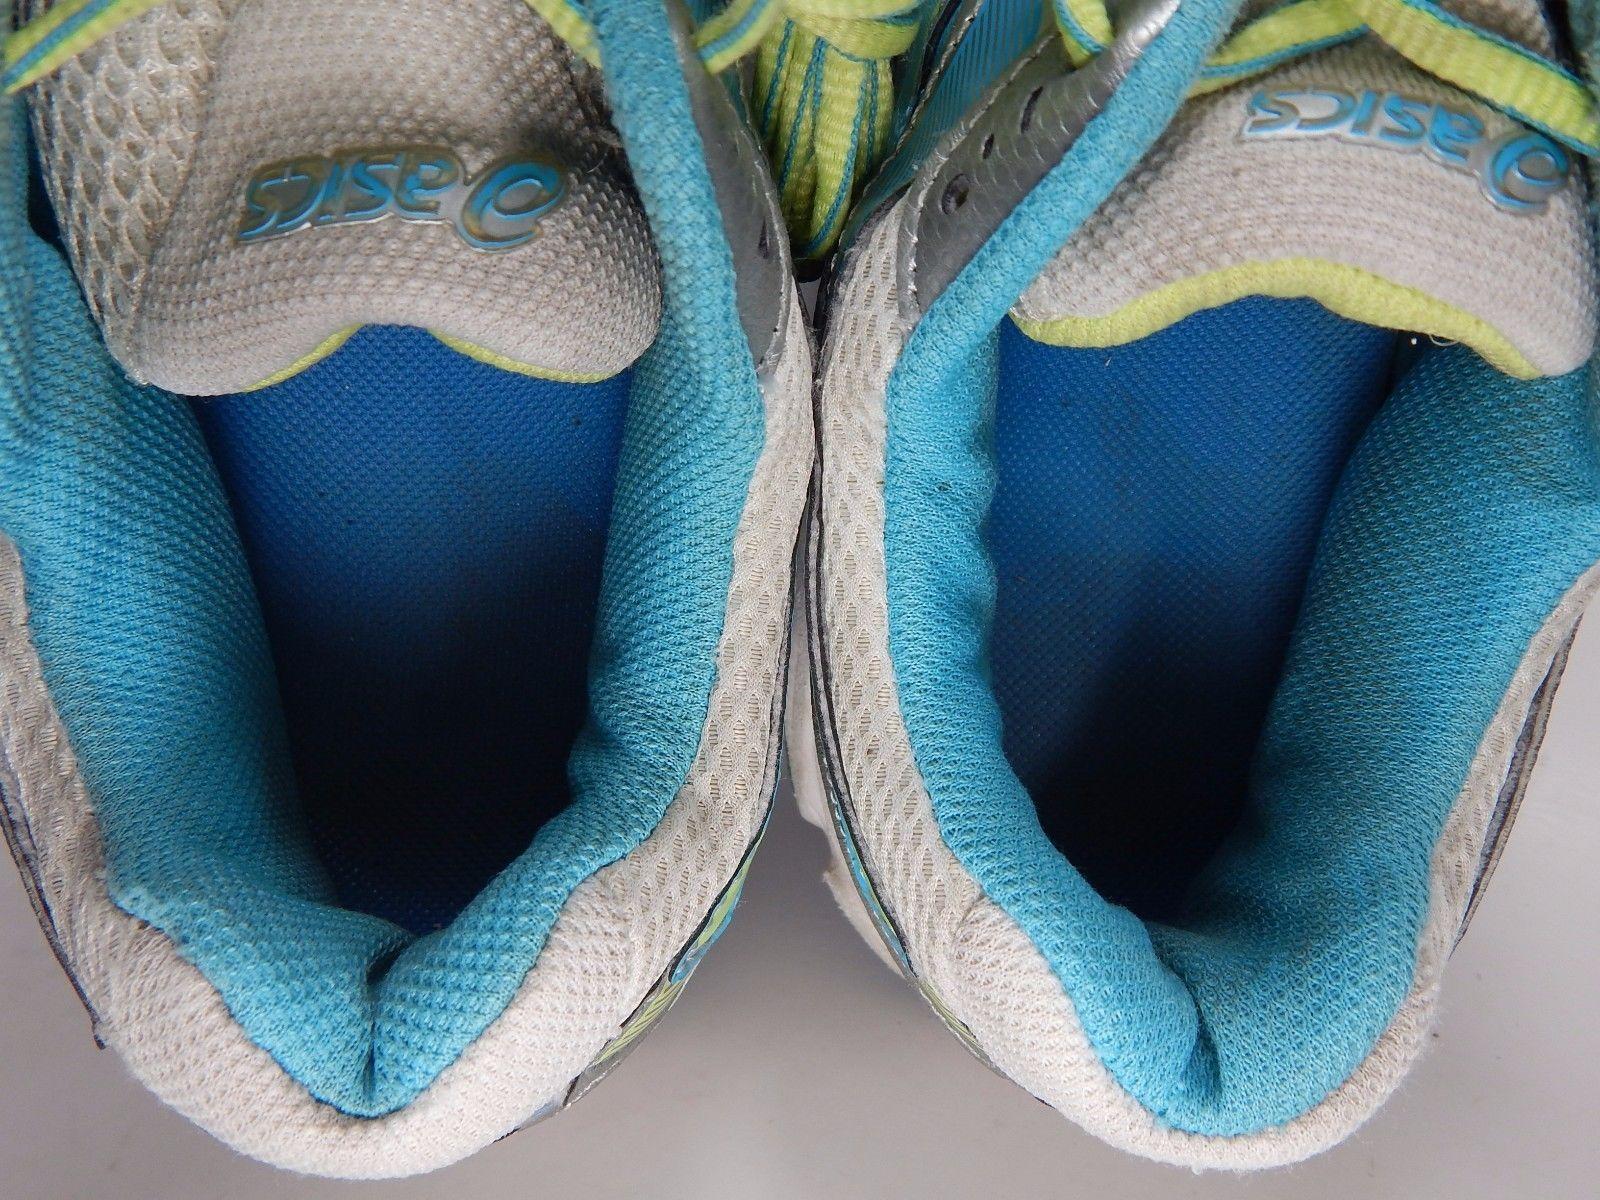 Asics Gel Contend 2 Women's Running Shoes Size US 11 M (B) EU 43.5 Silver T475N